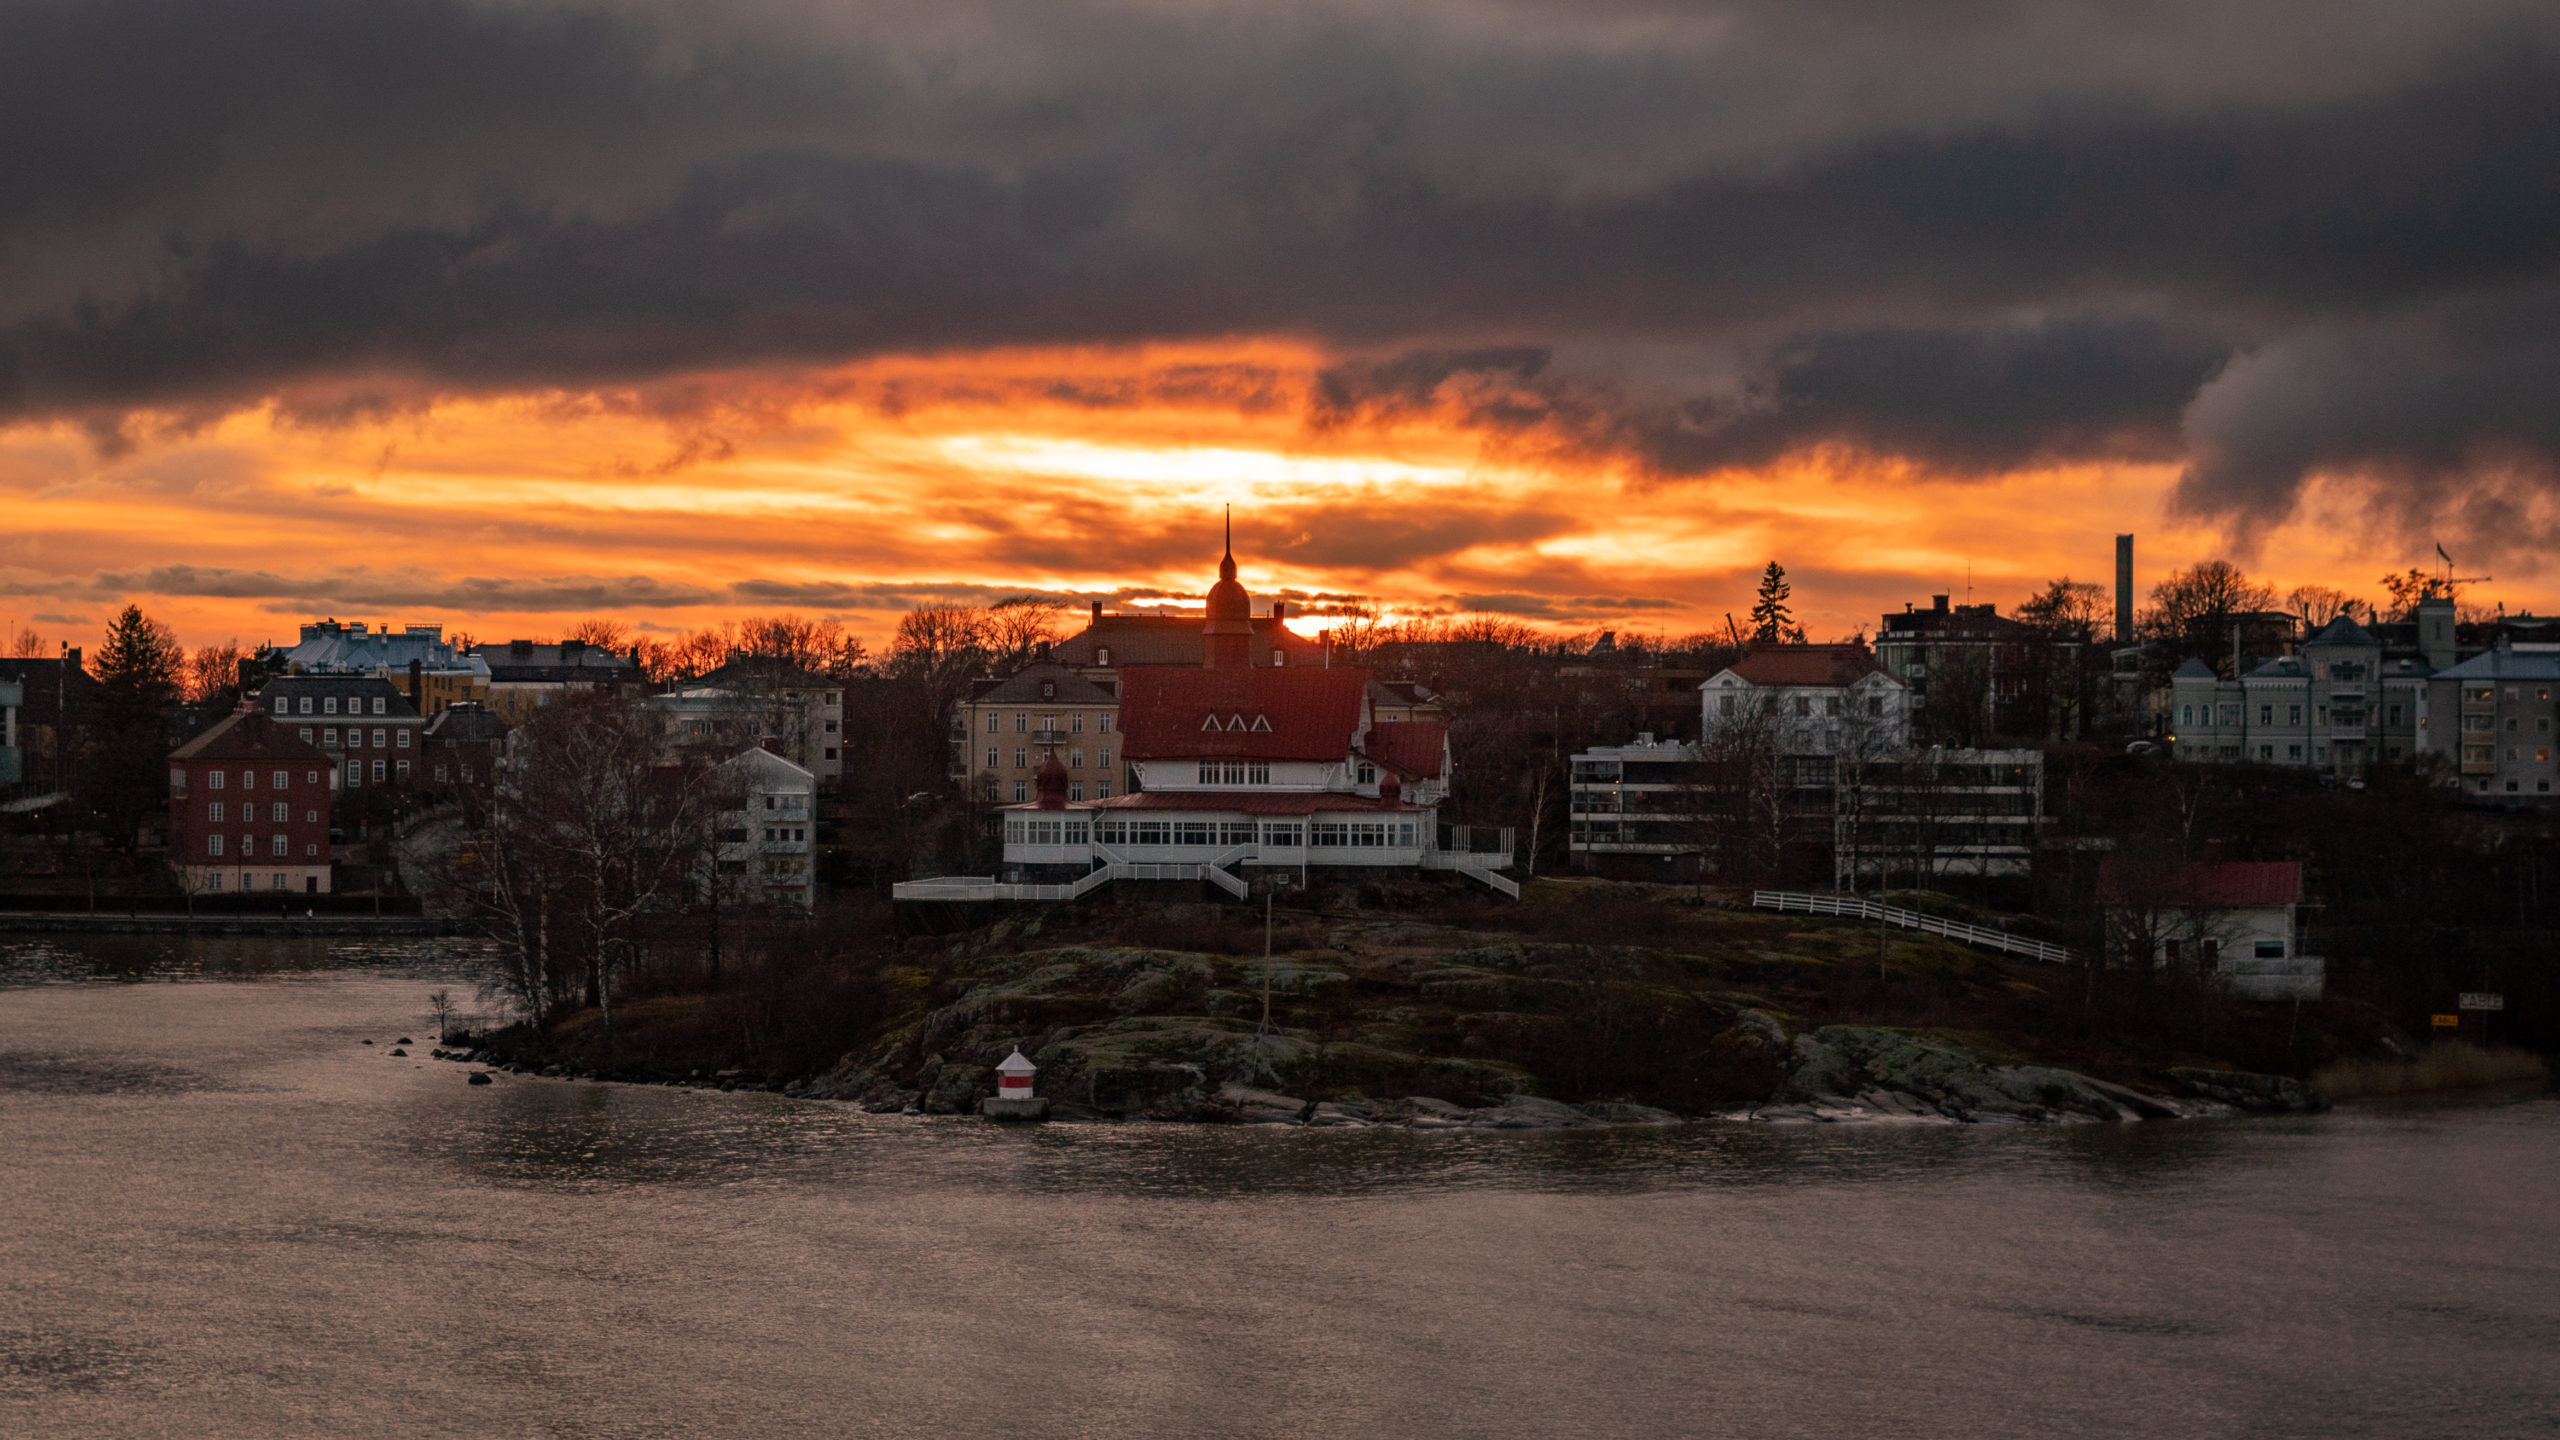 Aurinko laskeutuu Helsingin taa